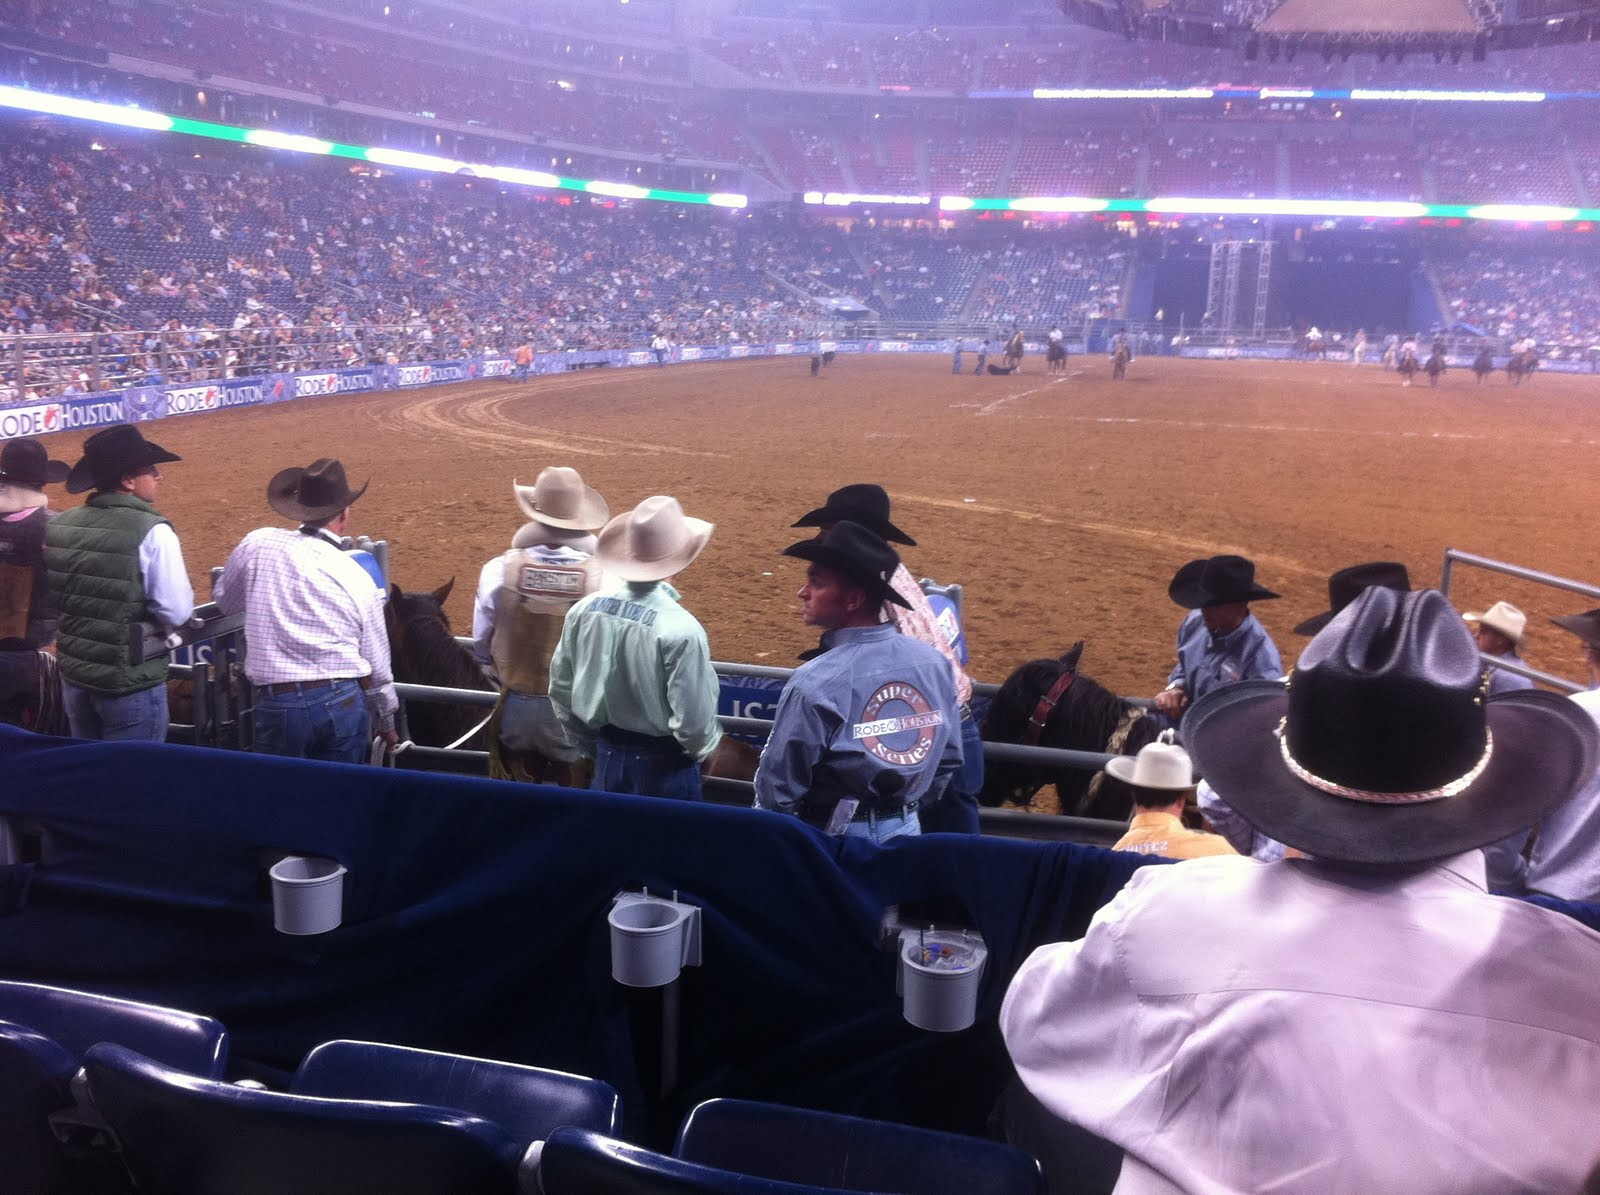 Houston Rodeo Chute Seats Acountry